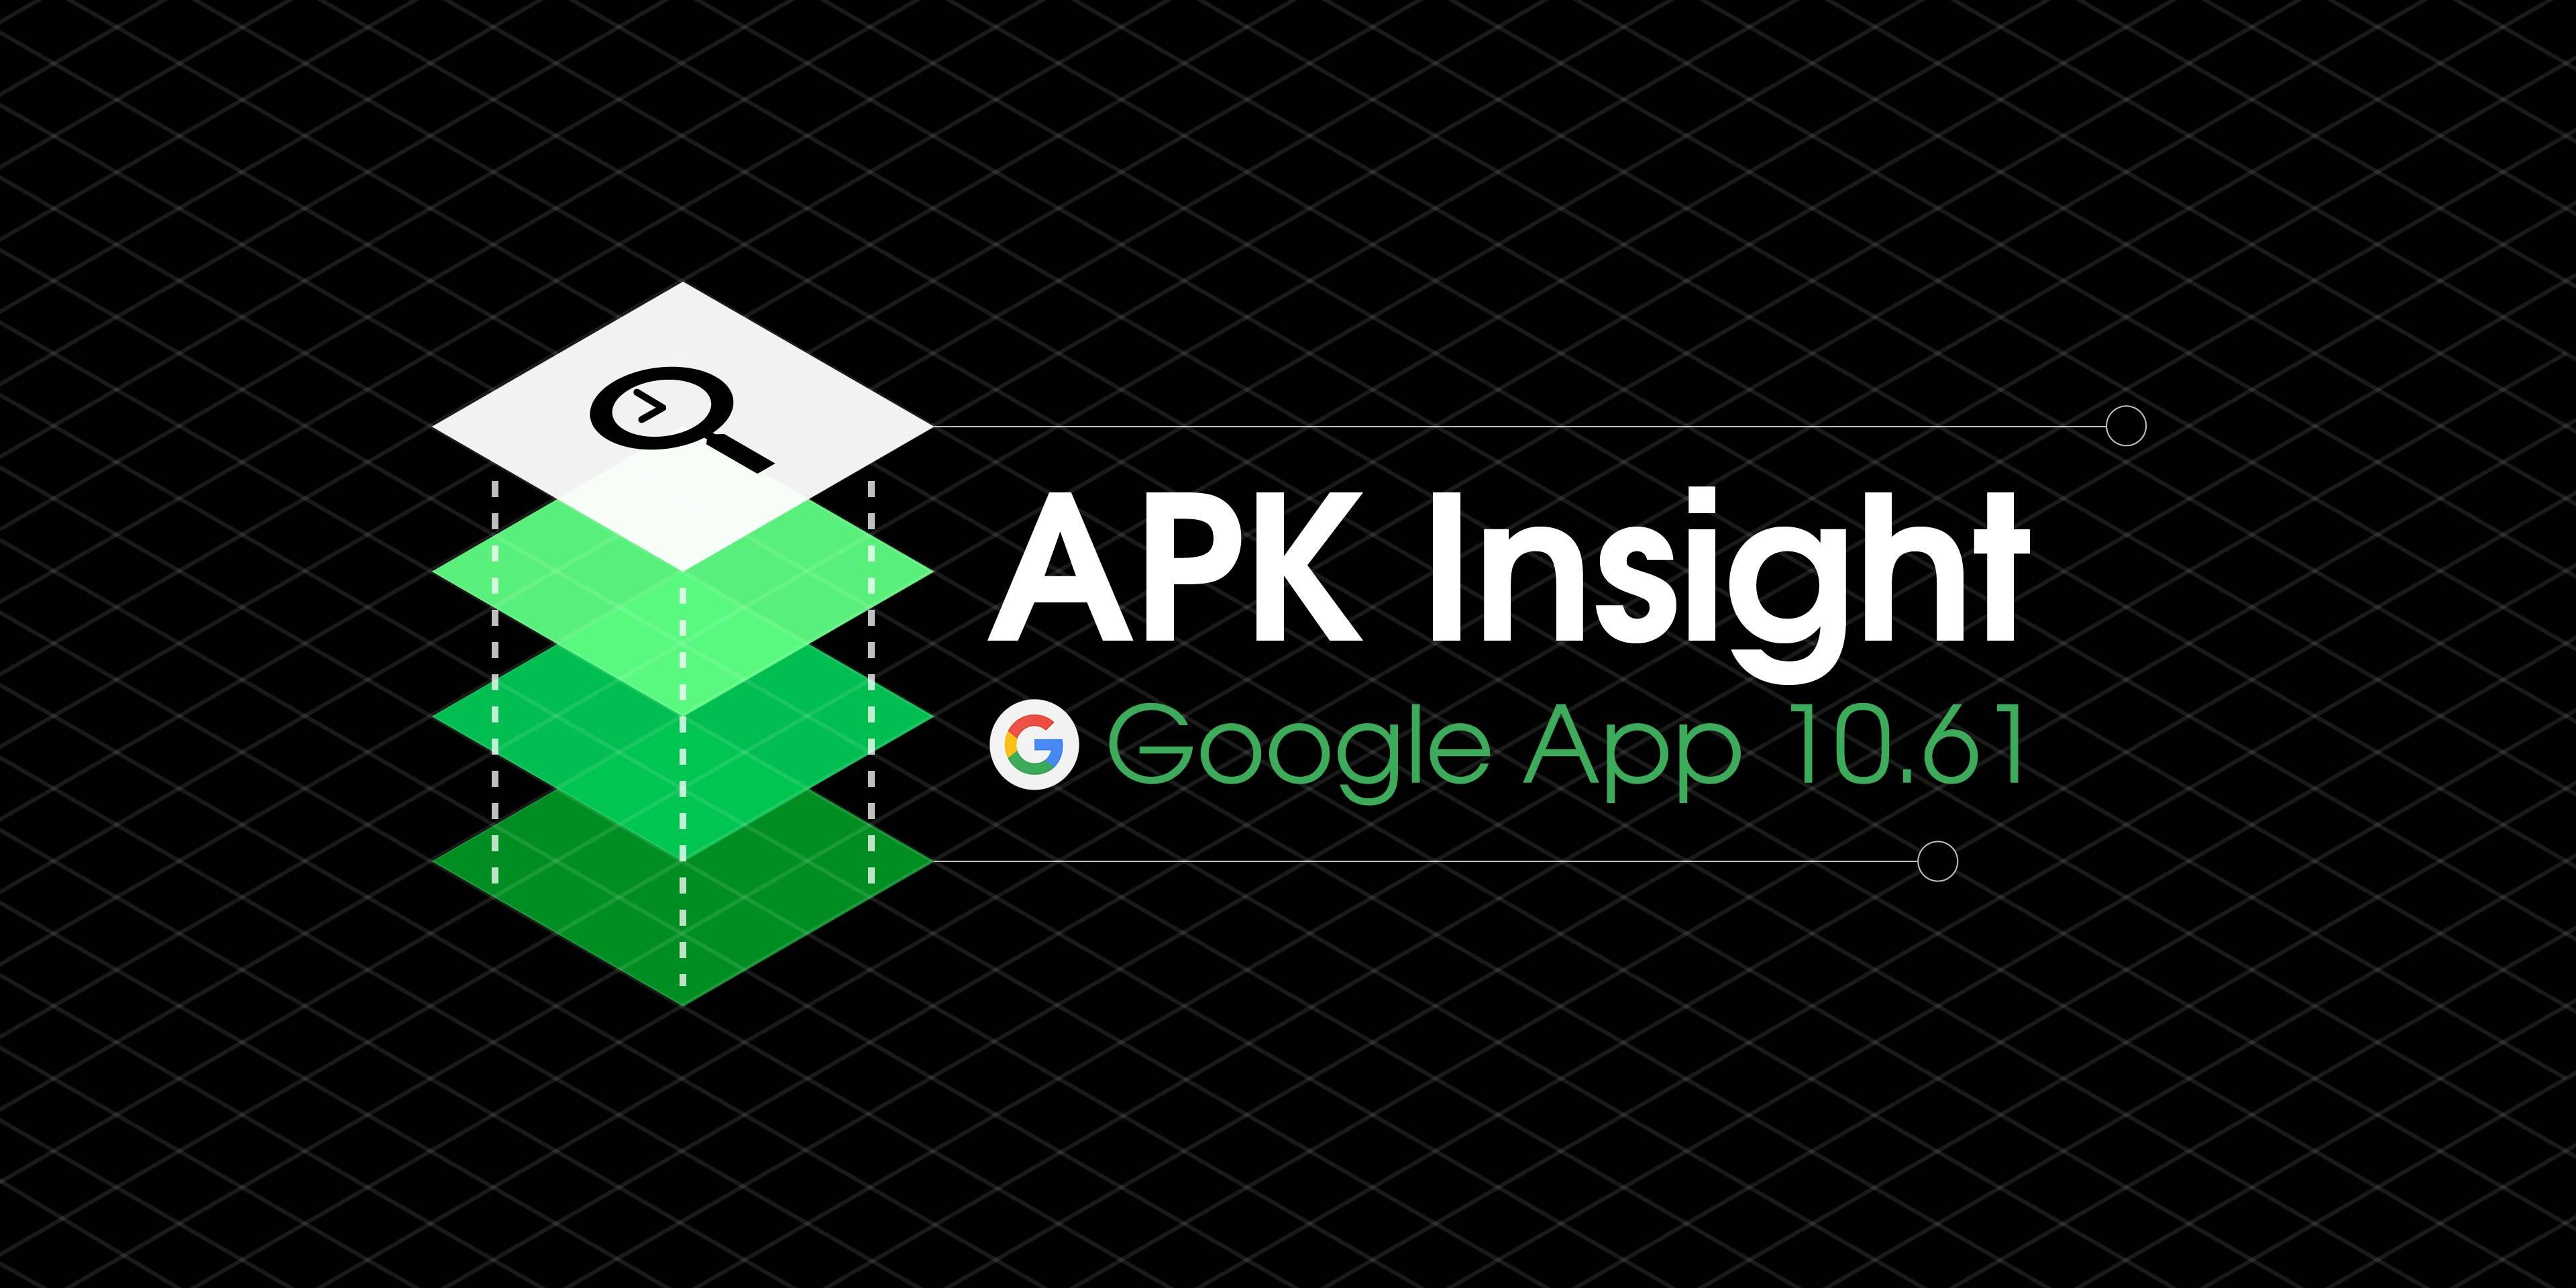 Google app 10.61 preps 'Smart Screenshots' with Lens, returns Assistant 'Preferred input' [APK Insight]